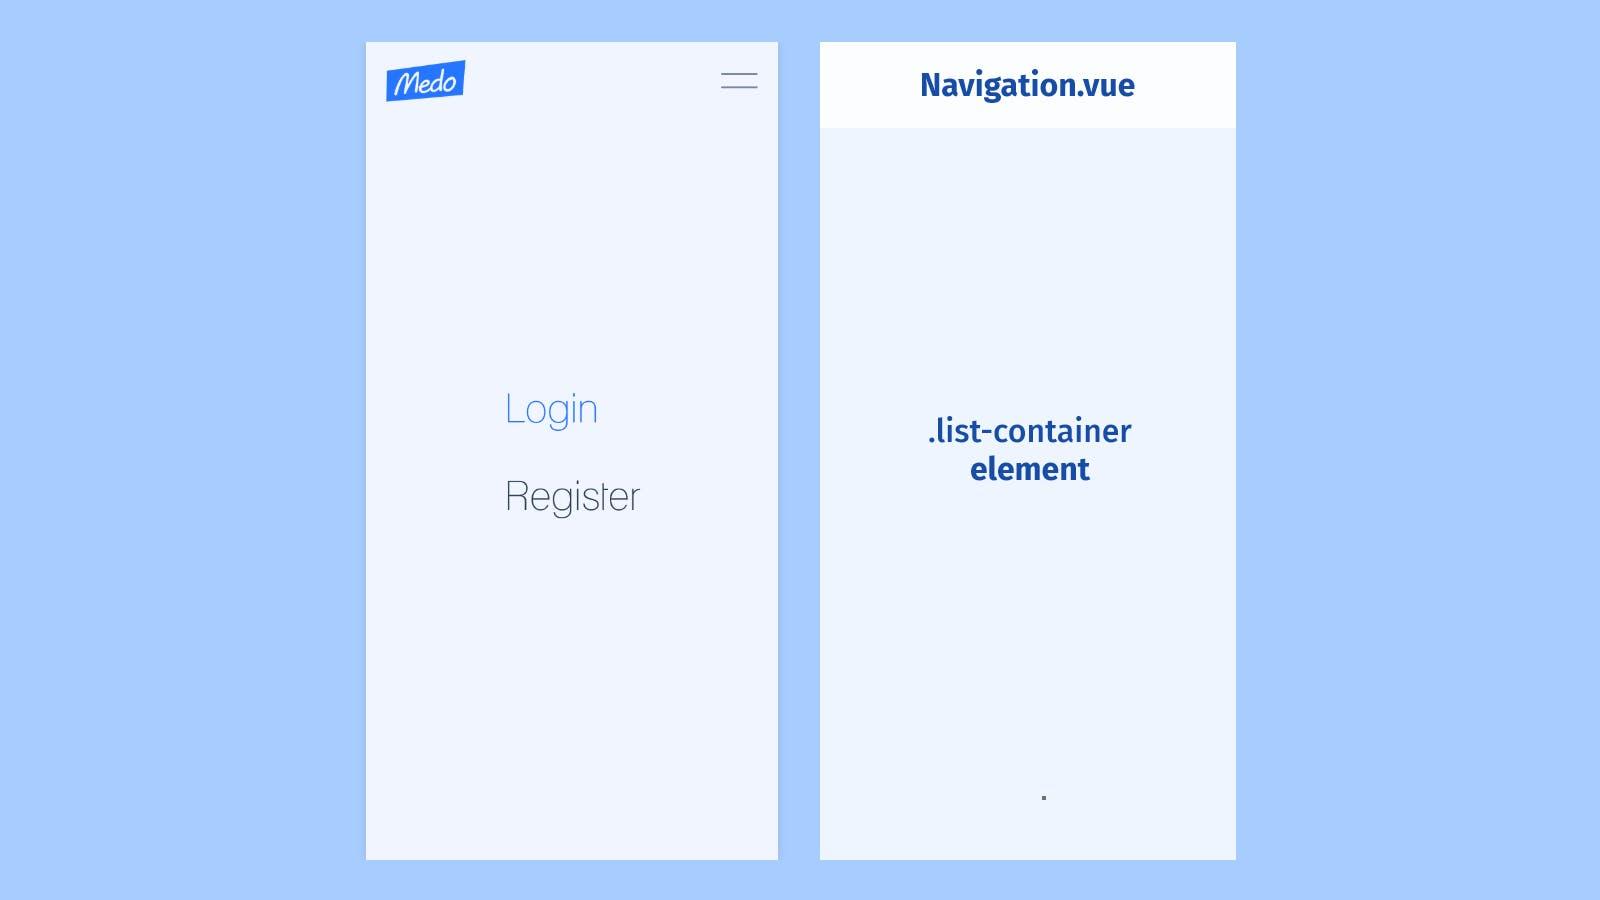 vue_3_img_2_navigation@2x.png